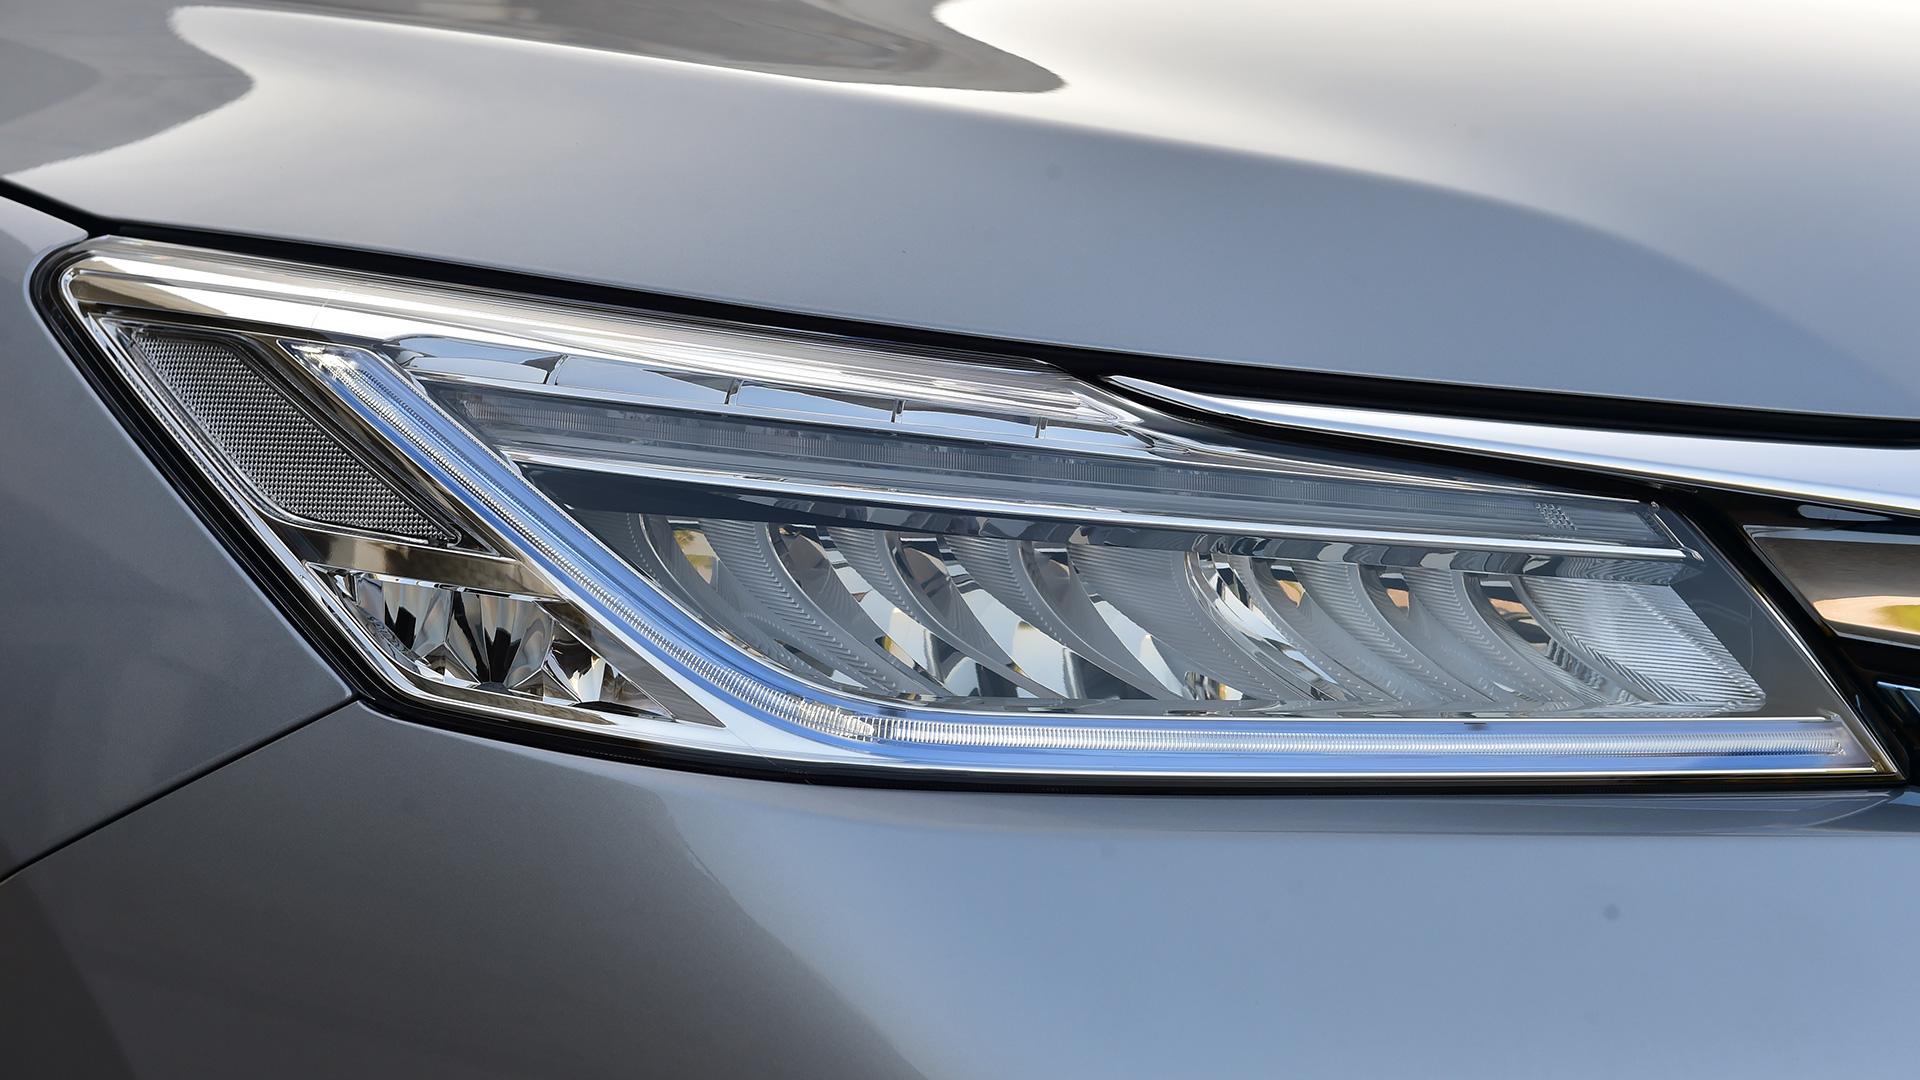 Honda Accord Hybrid 2016 STD Exterior